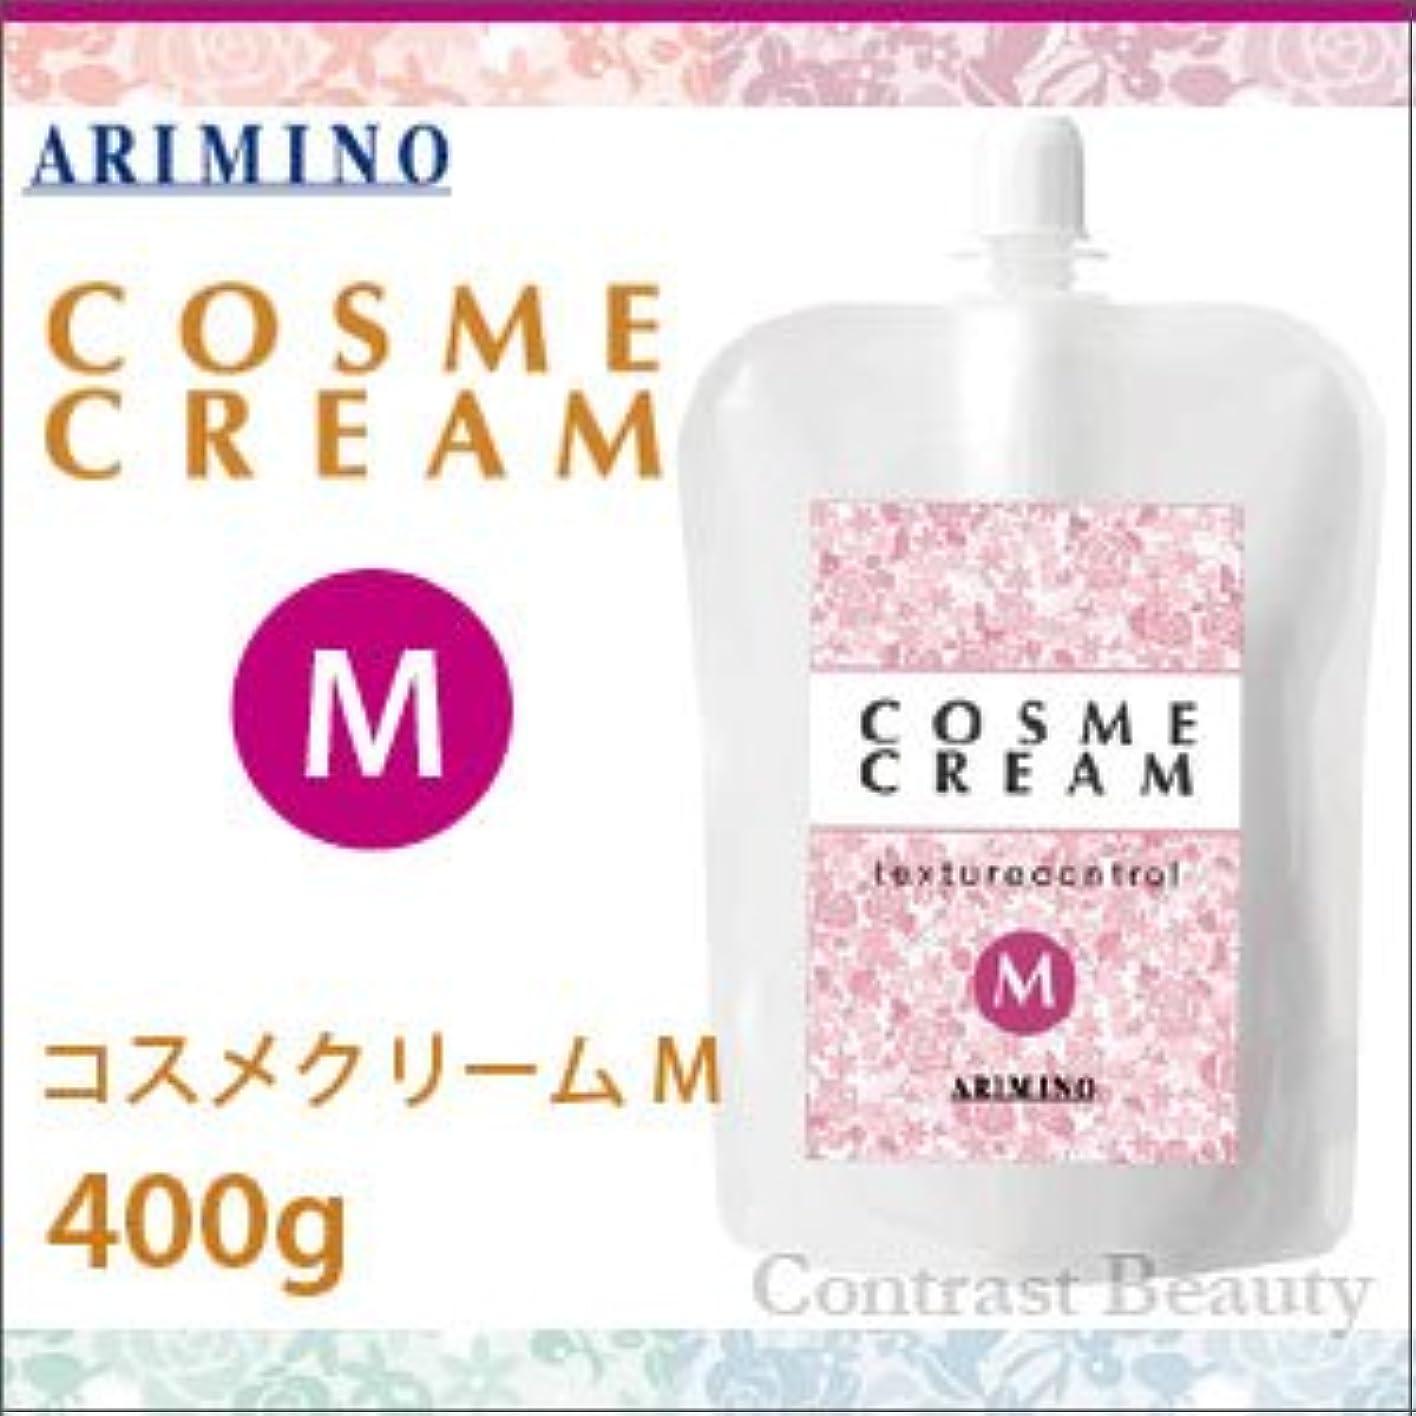 【X5個セット】 アリミノ コスメクリーム M 400g